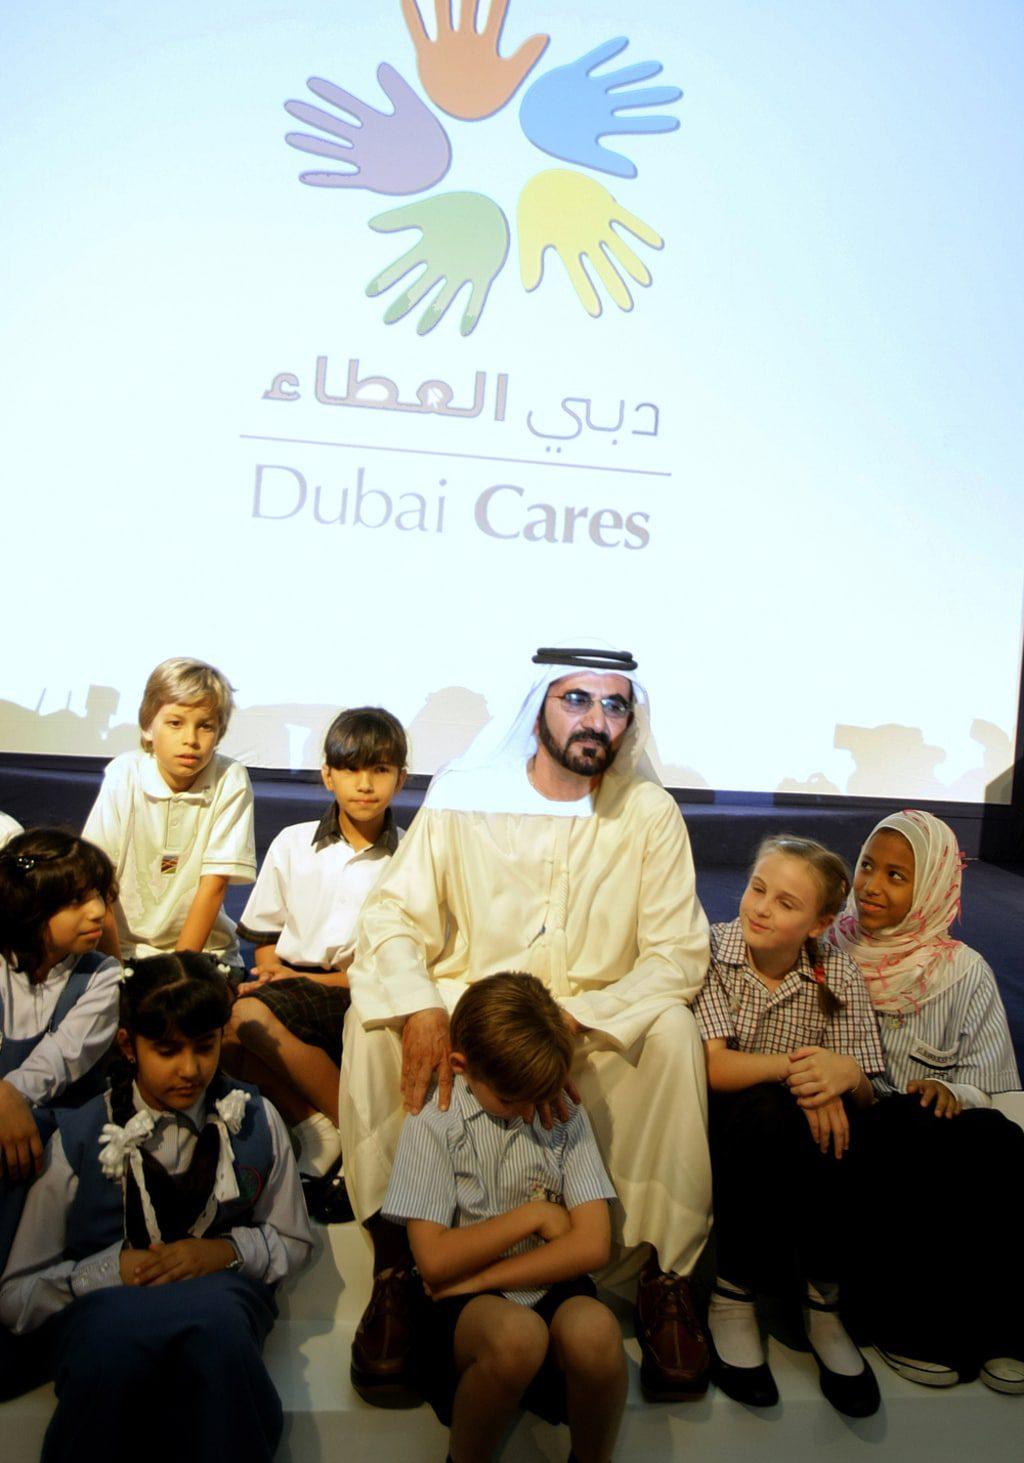 UAE-society-Mohammed bin Rashid al-Maktoum